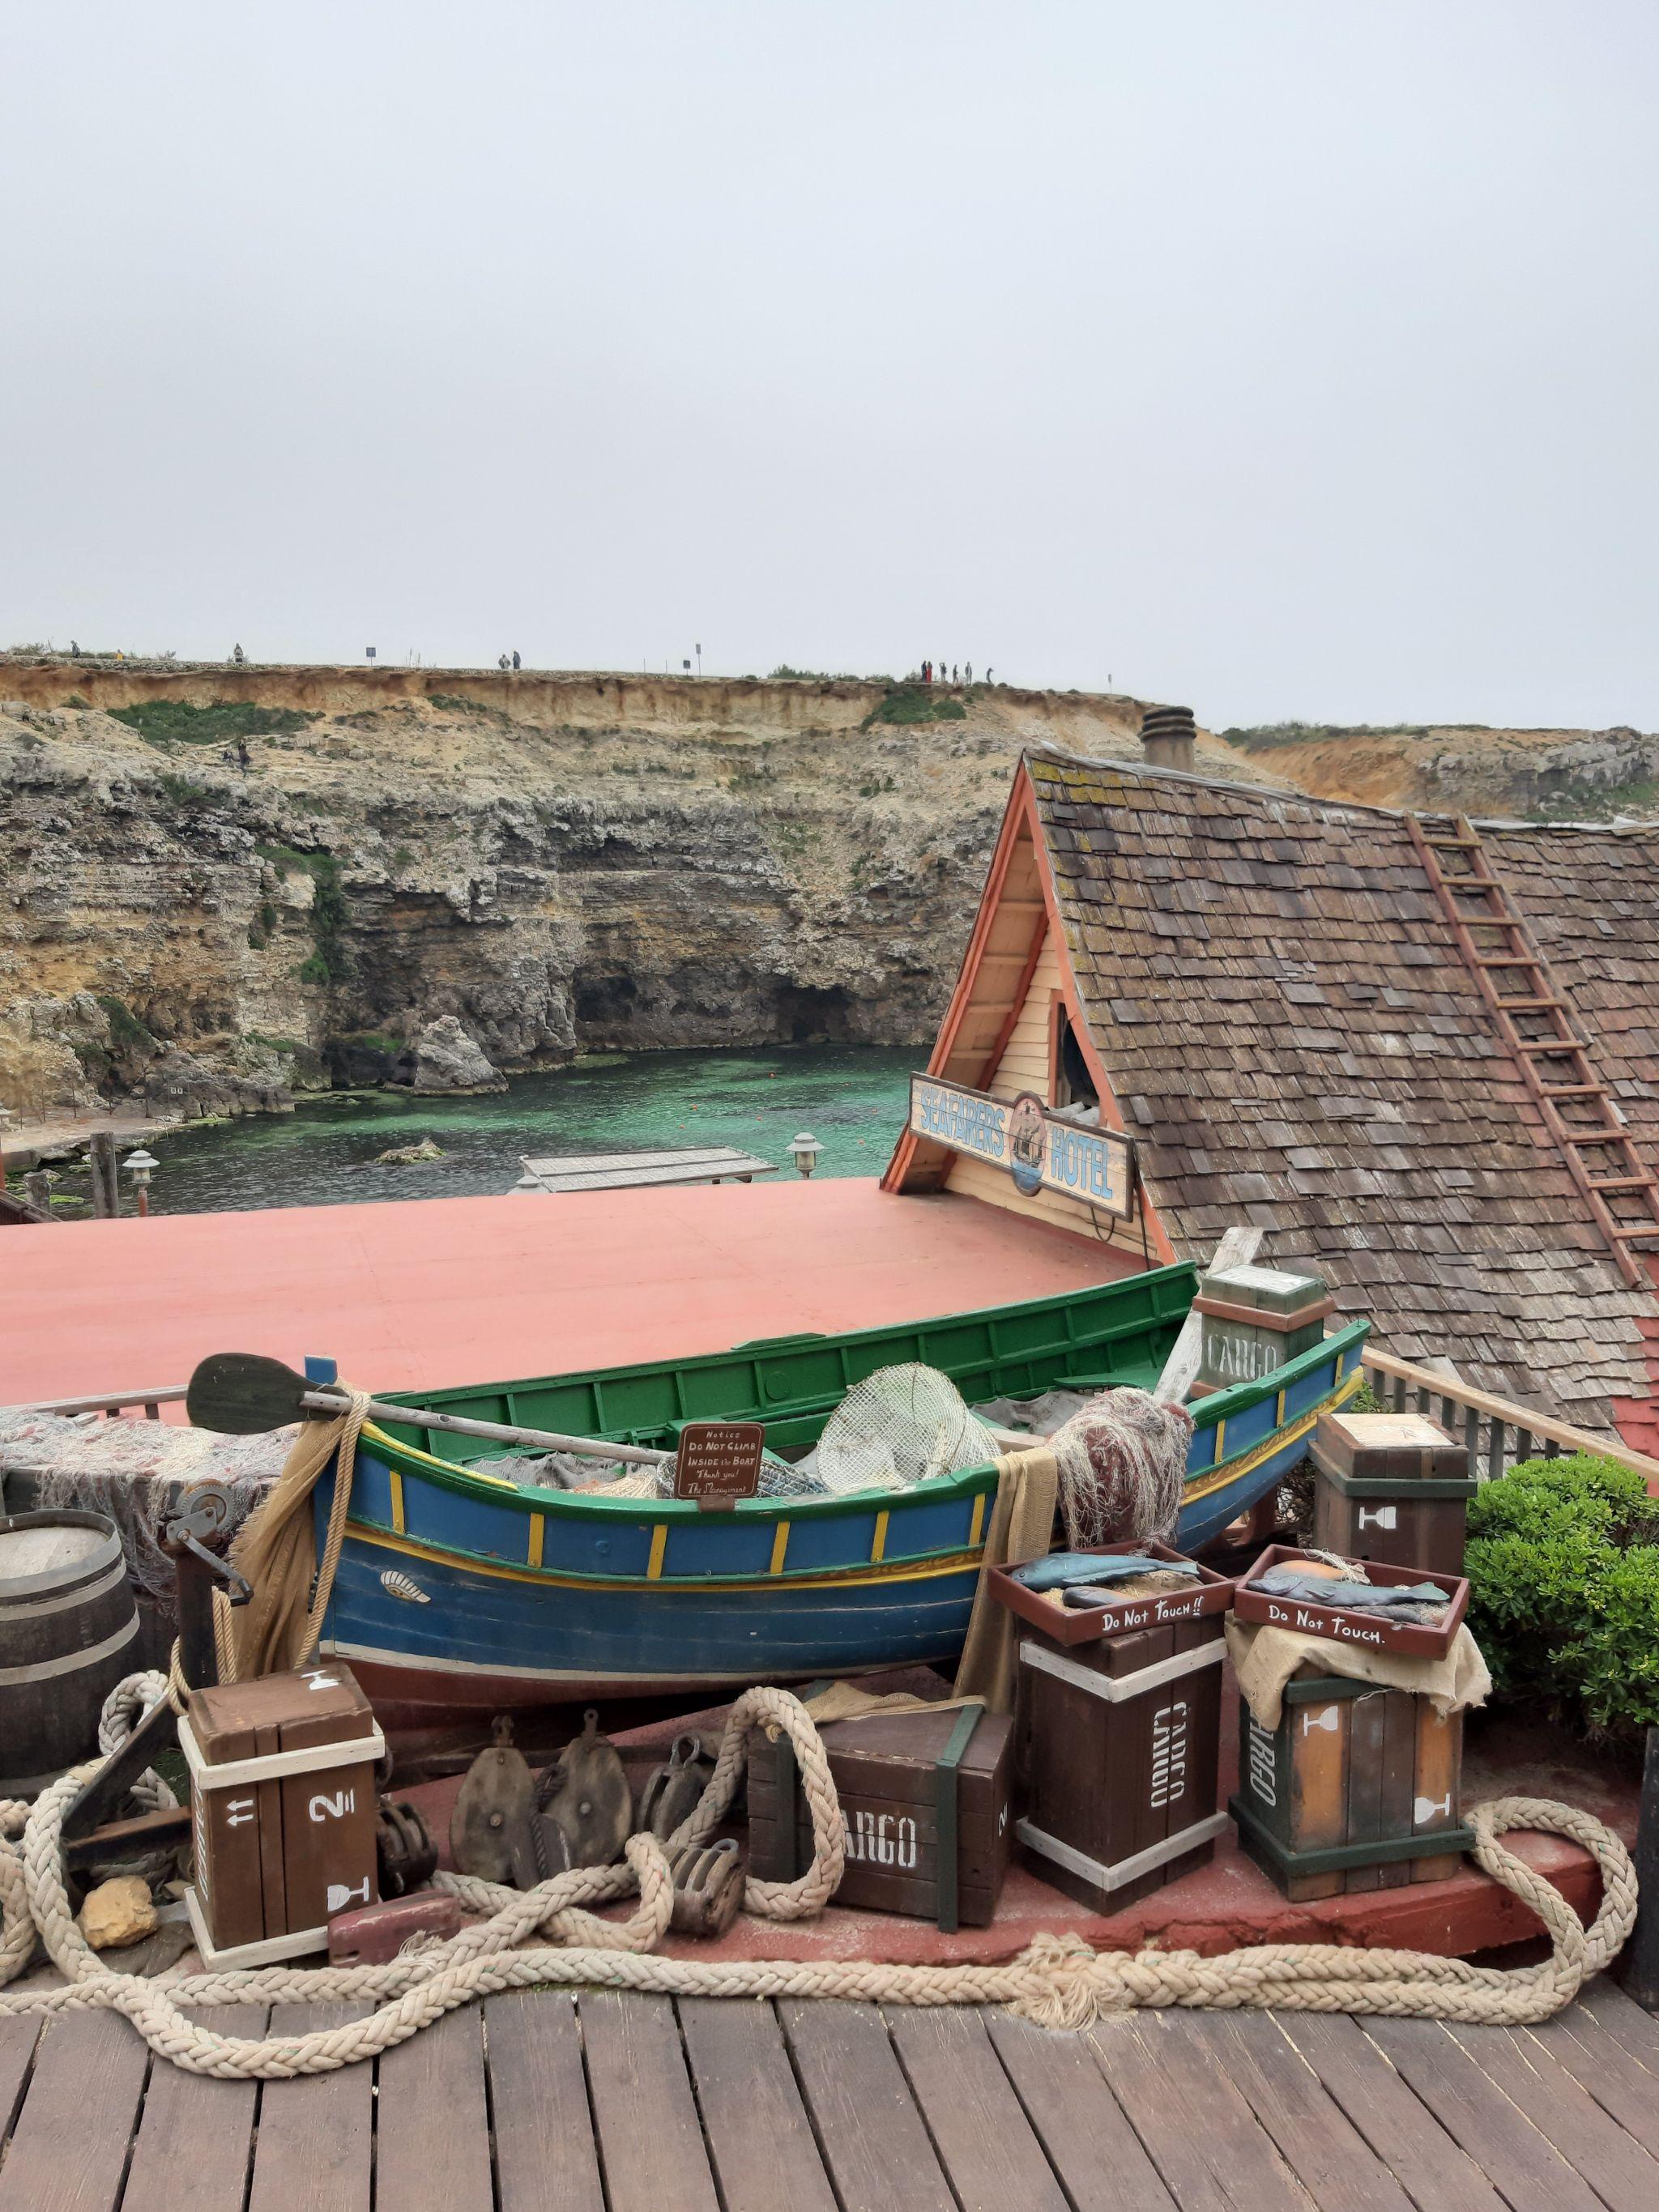 malta, malta blog post, live lavishly, Gozo, Popeye village, Disney Malta, blue lagoon, things to do Malta, valetta